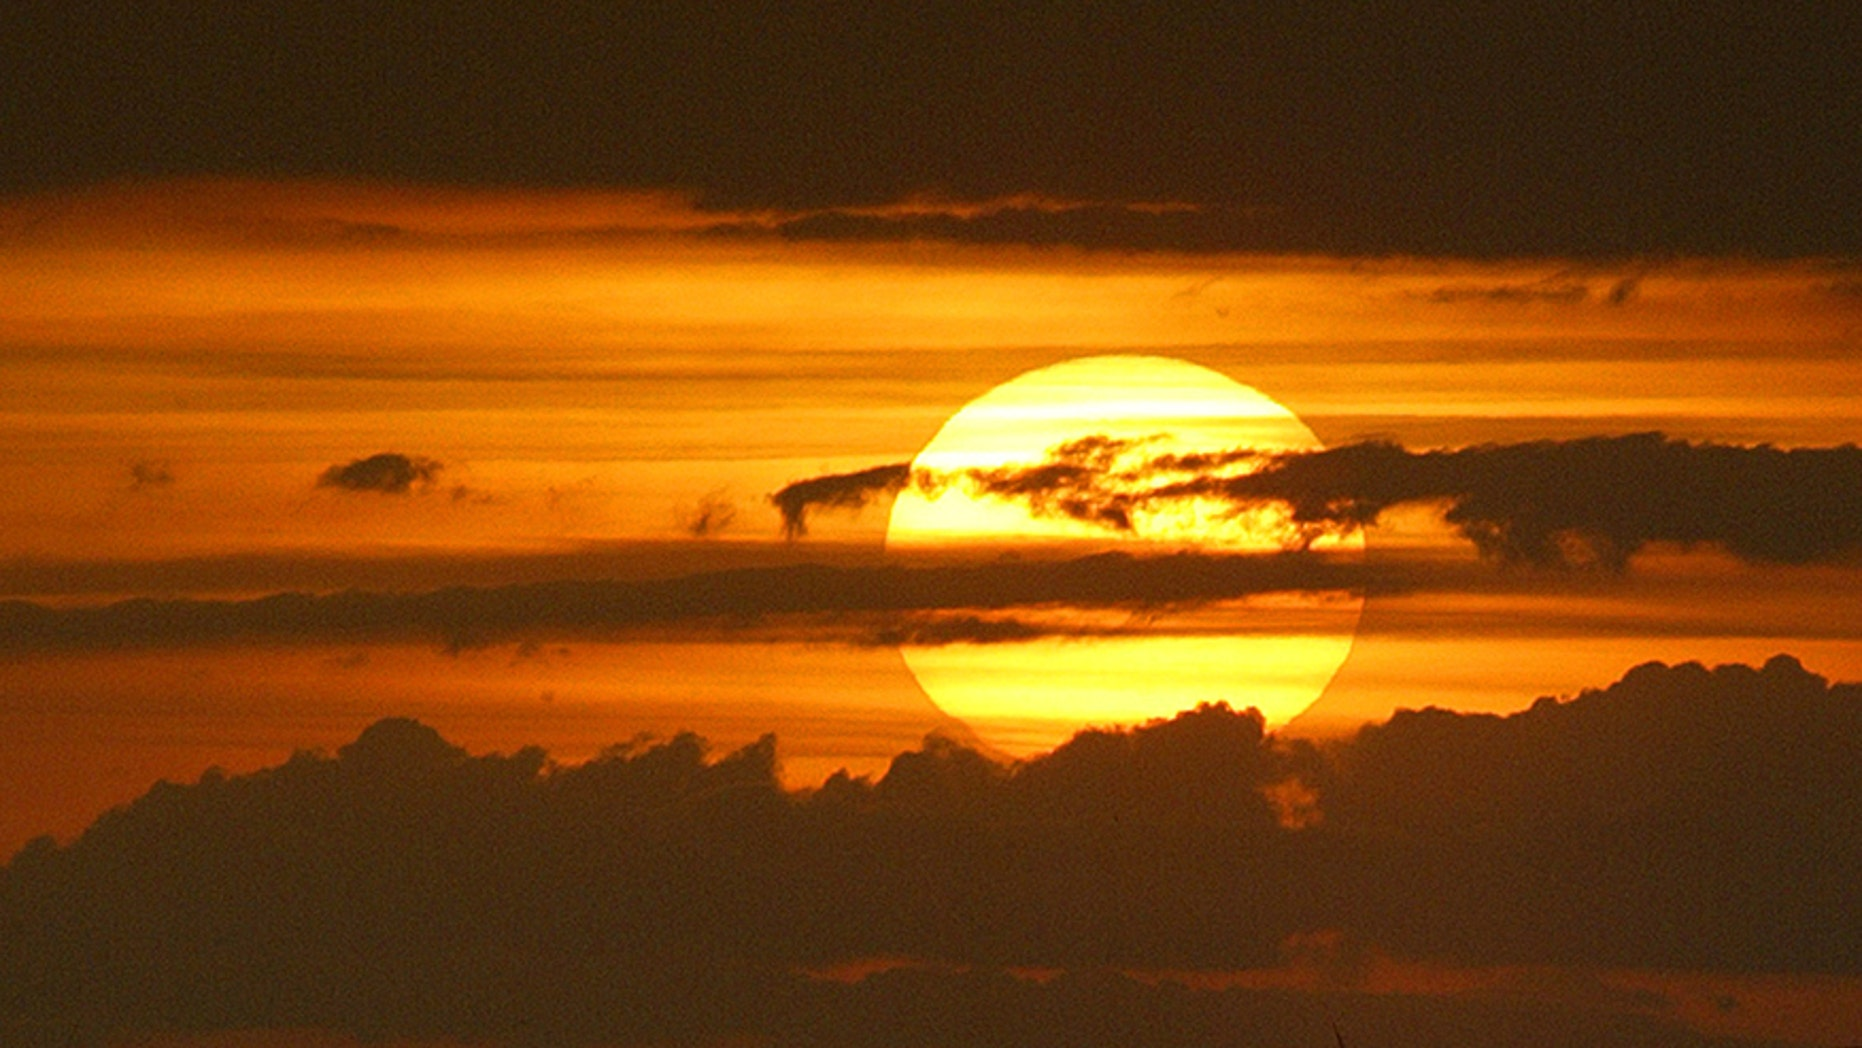 Sunset on Bali August 13, 2003